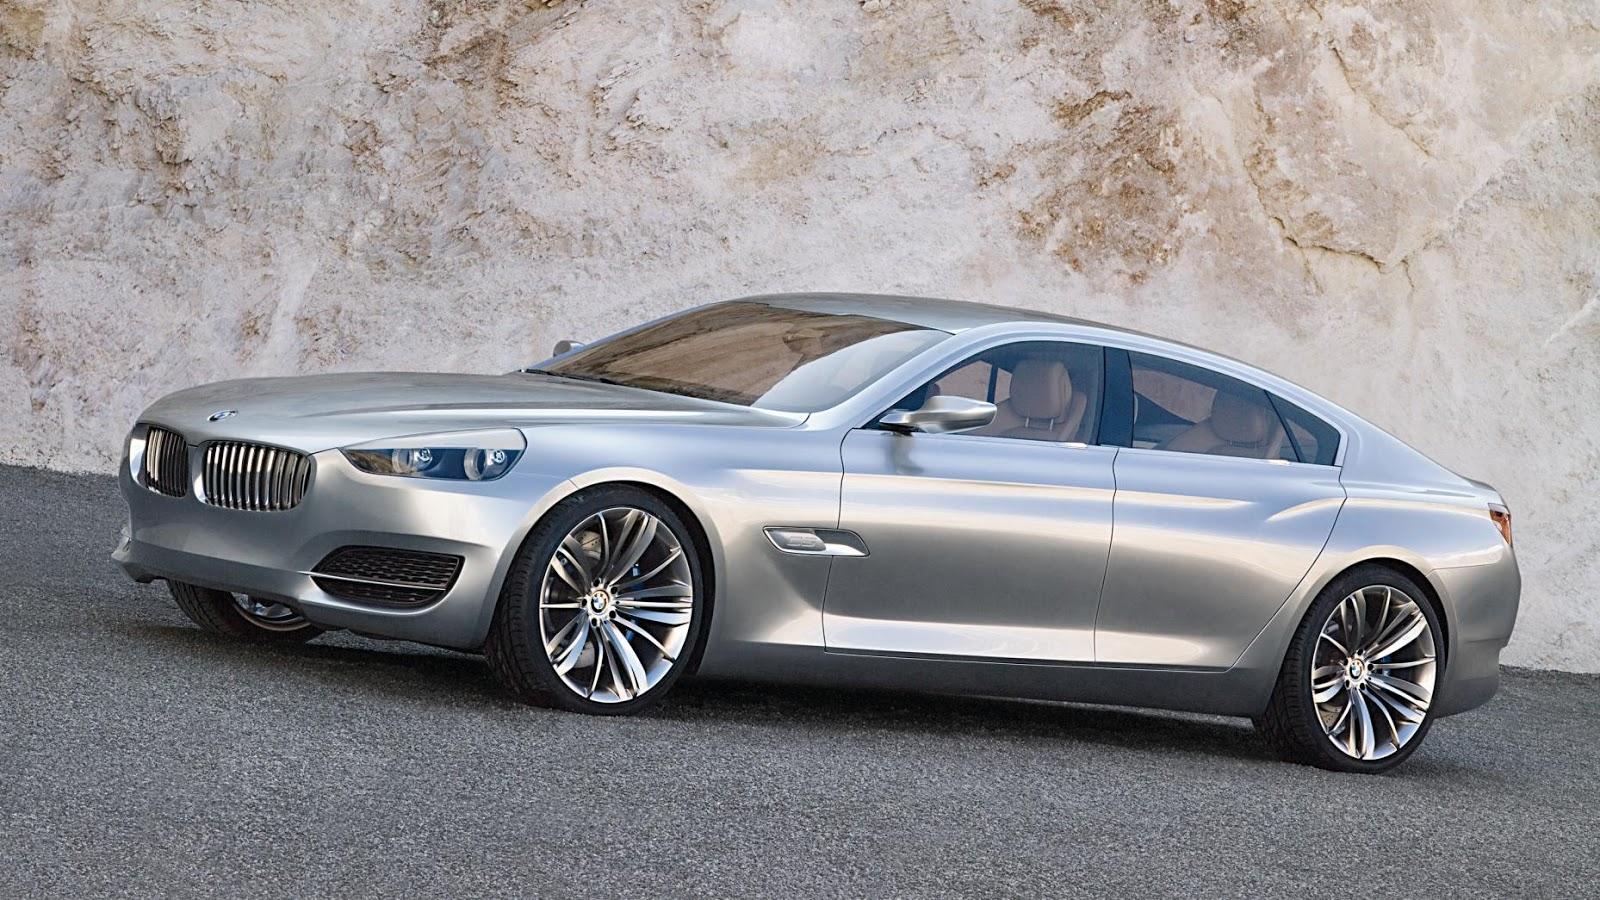 2007: BMW Concept CS